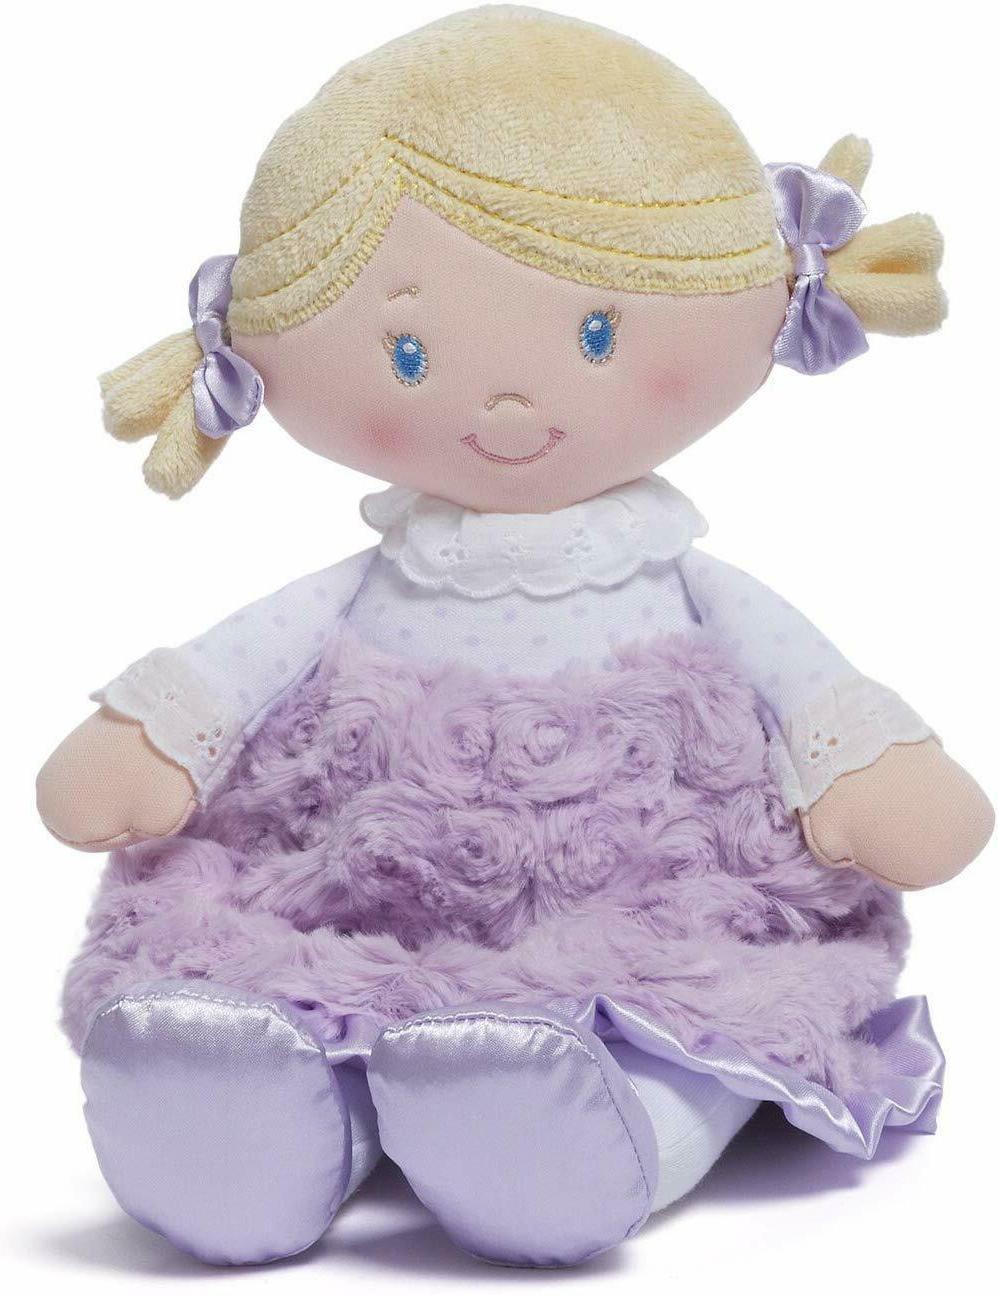 "Baby Gund blonde doll 'Cece'  11"" NWT Super soft for babies"